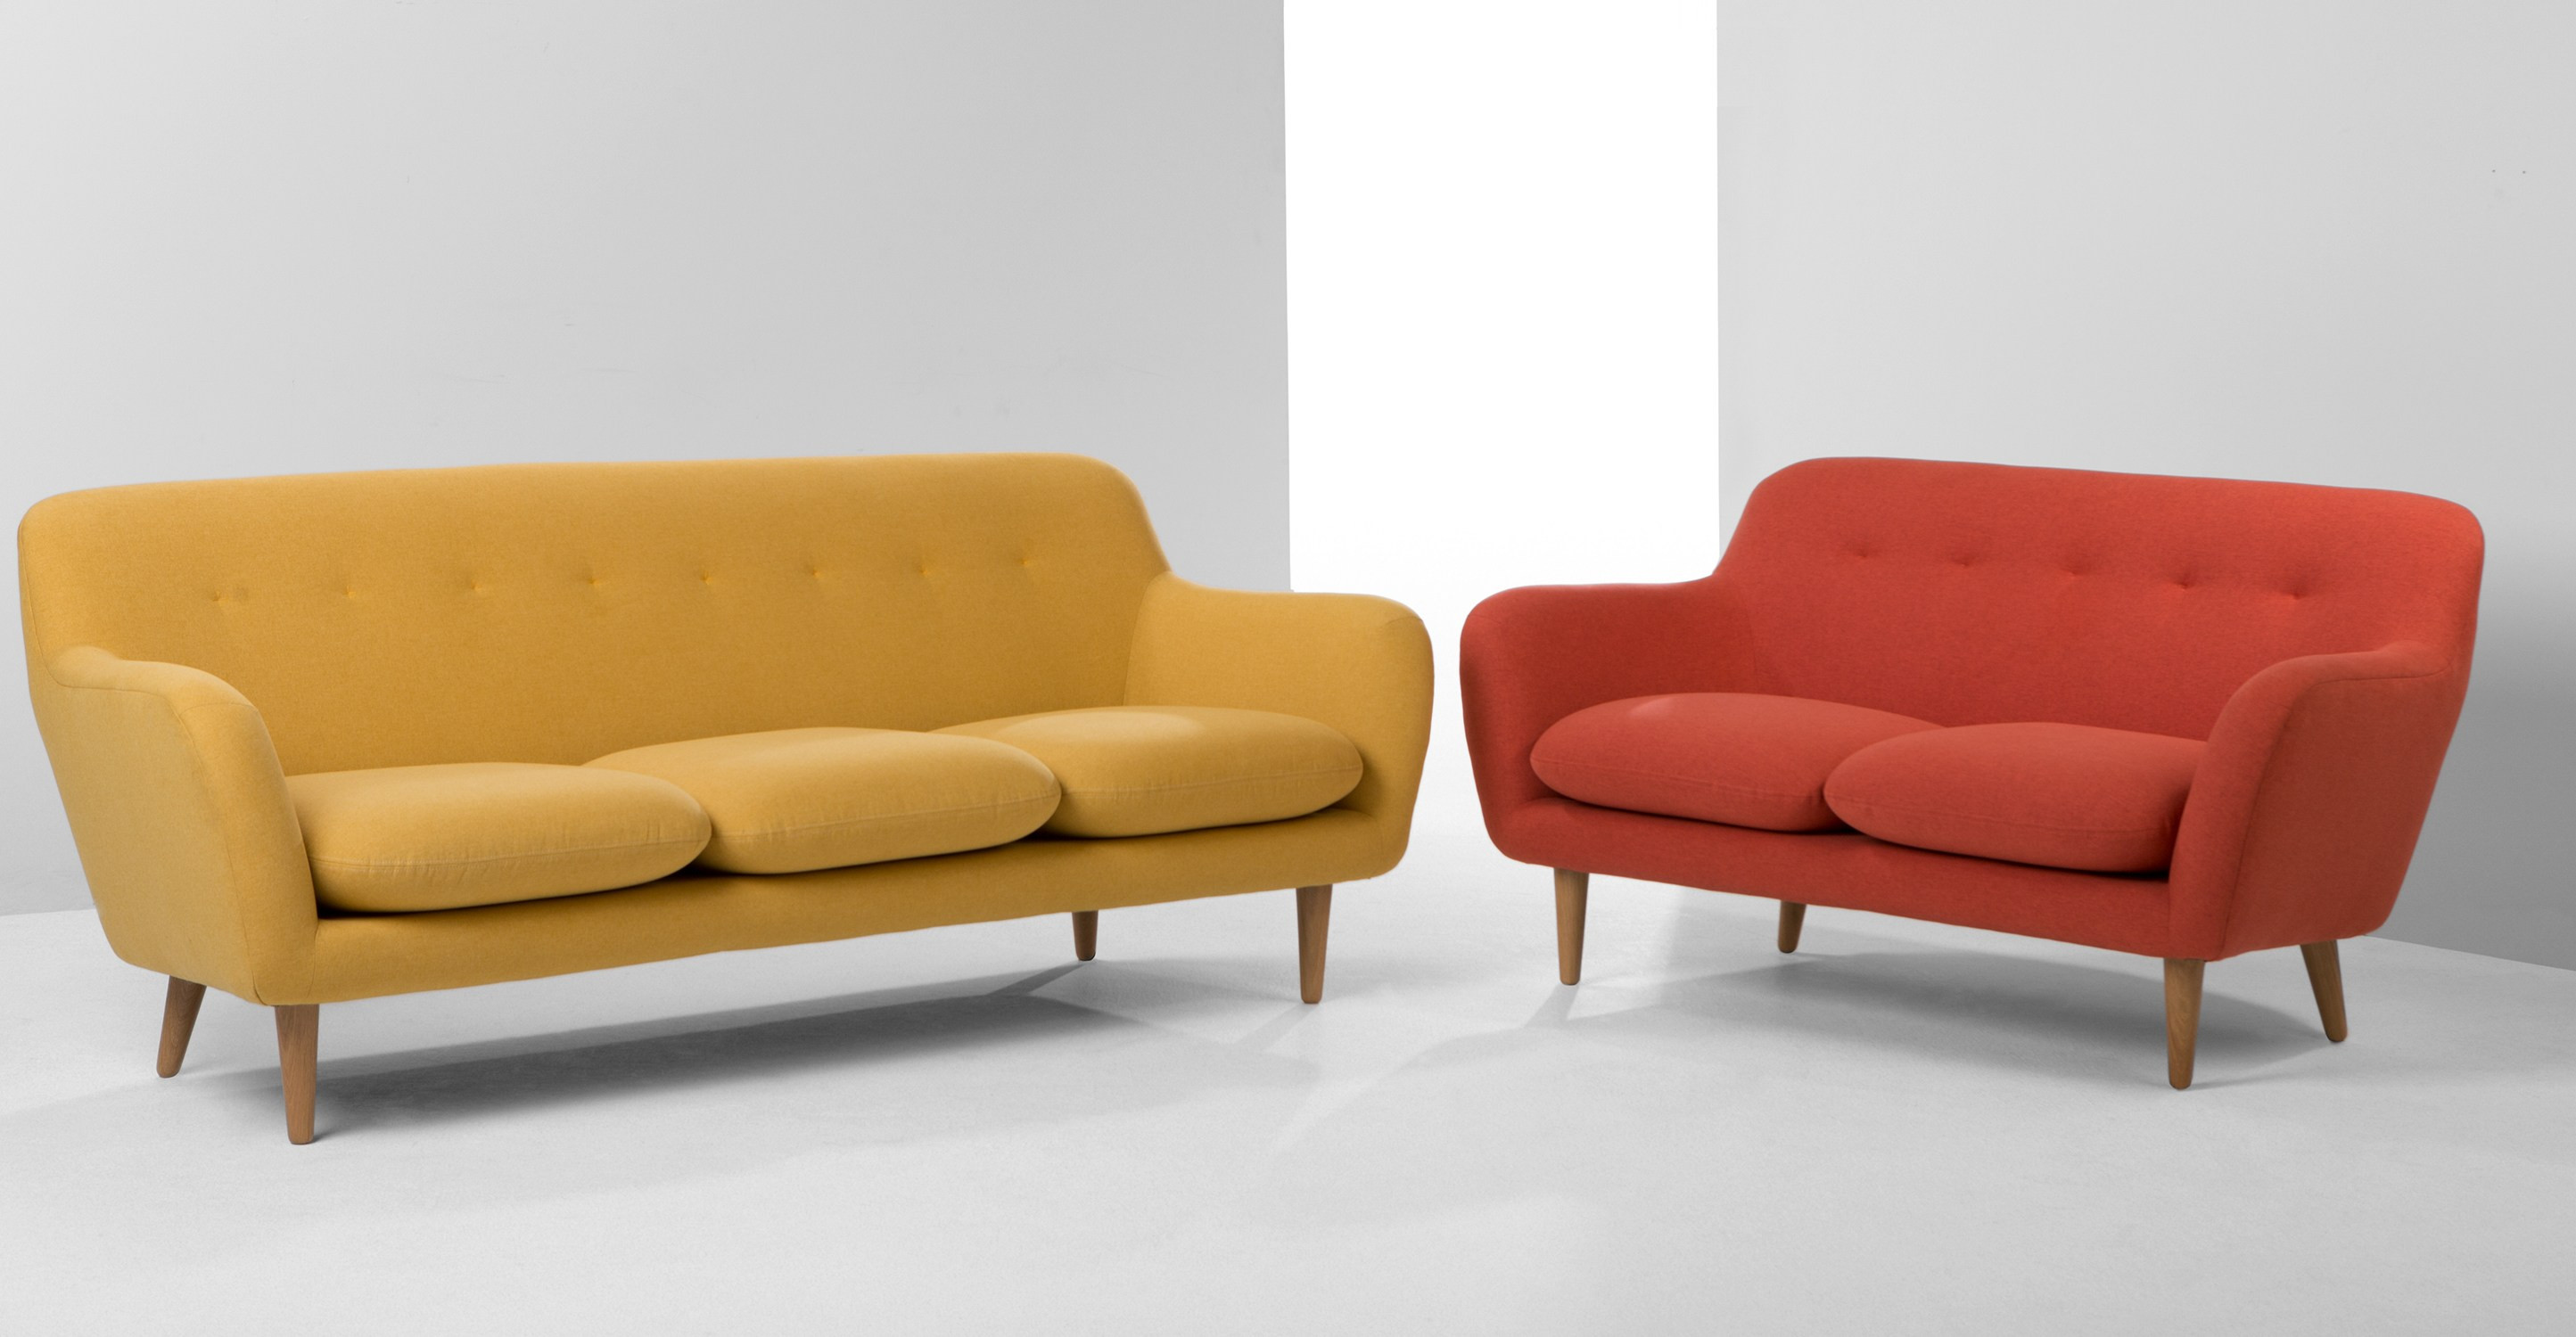 Retro Sofa  DYLAN 2 Seater Sofa Retro Orange